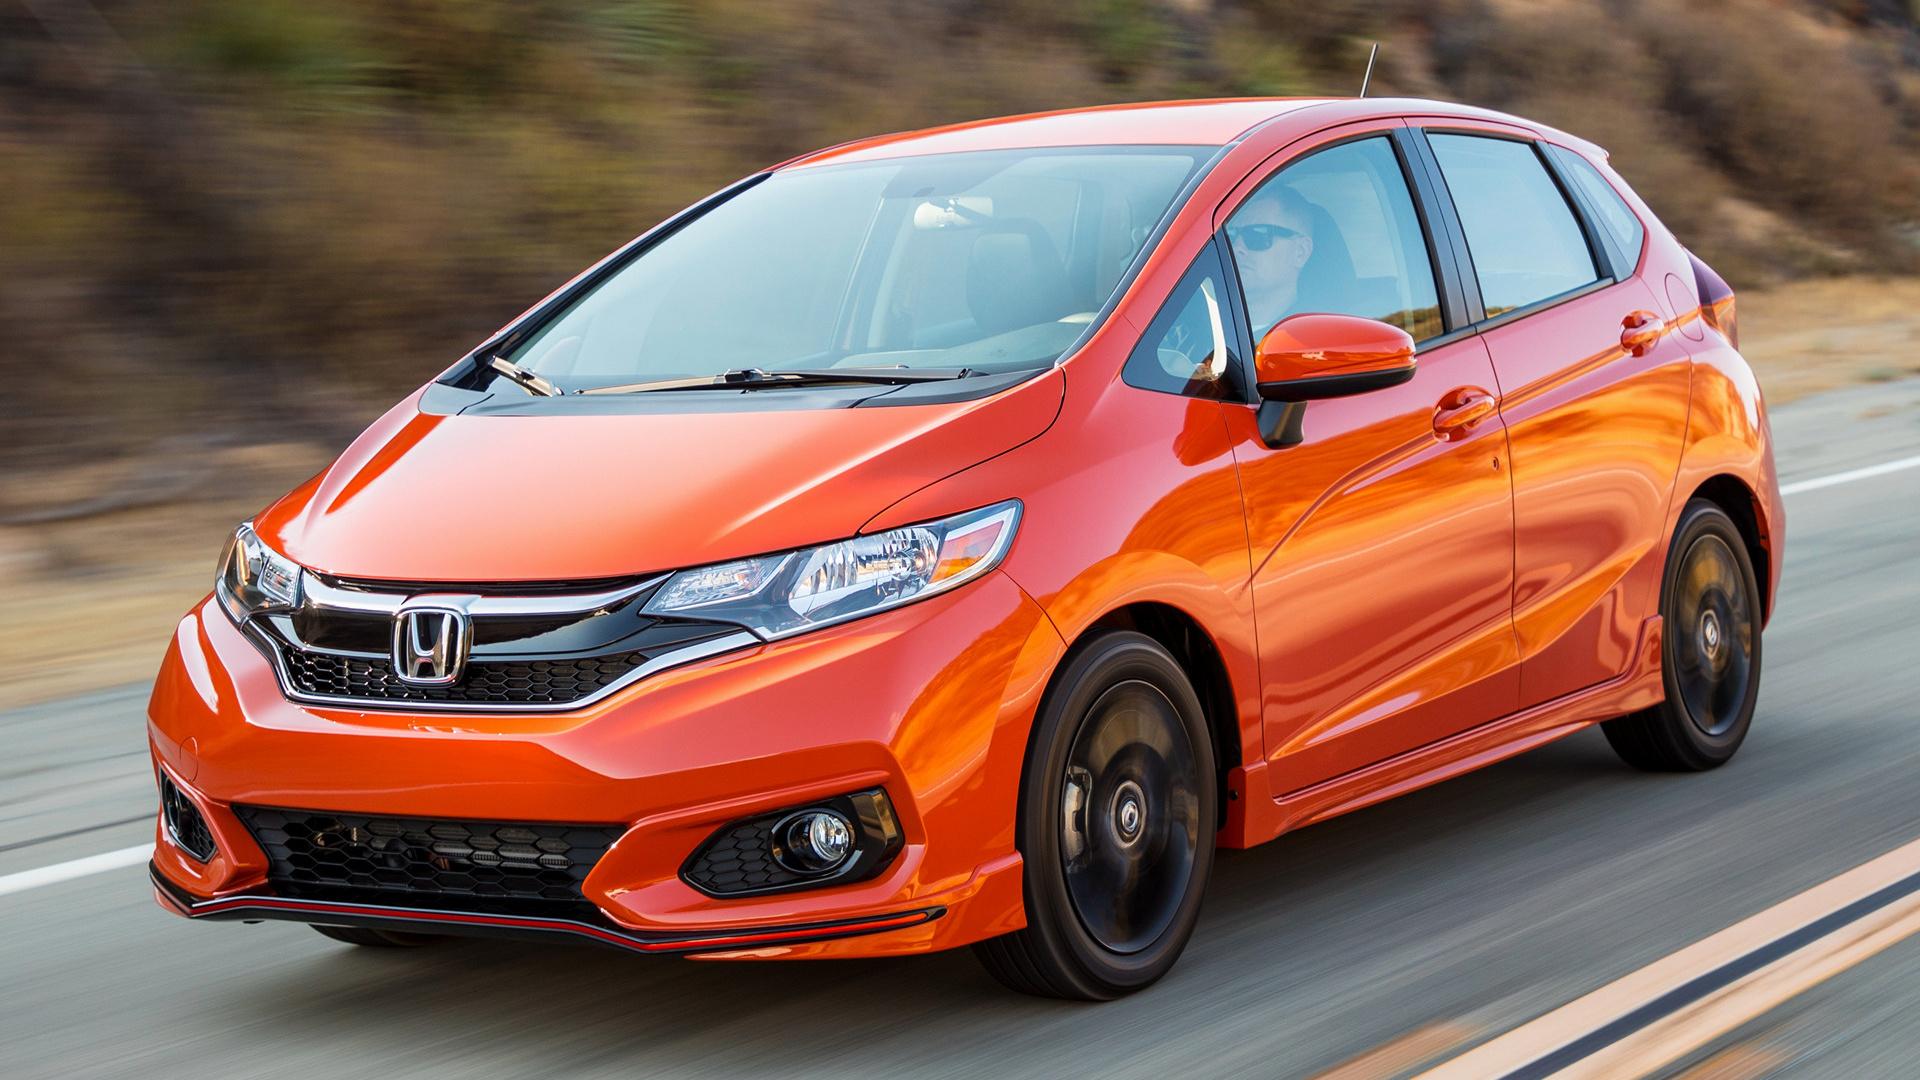 2018 Honda Fit Sport - Wallpapers and HD Images | Car Pixel